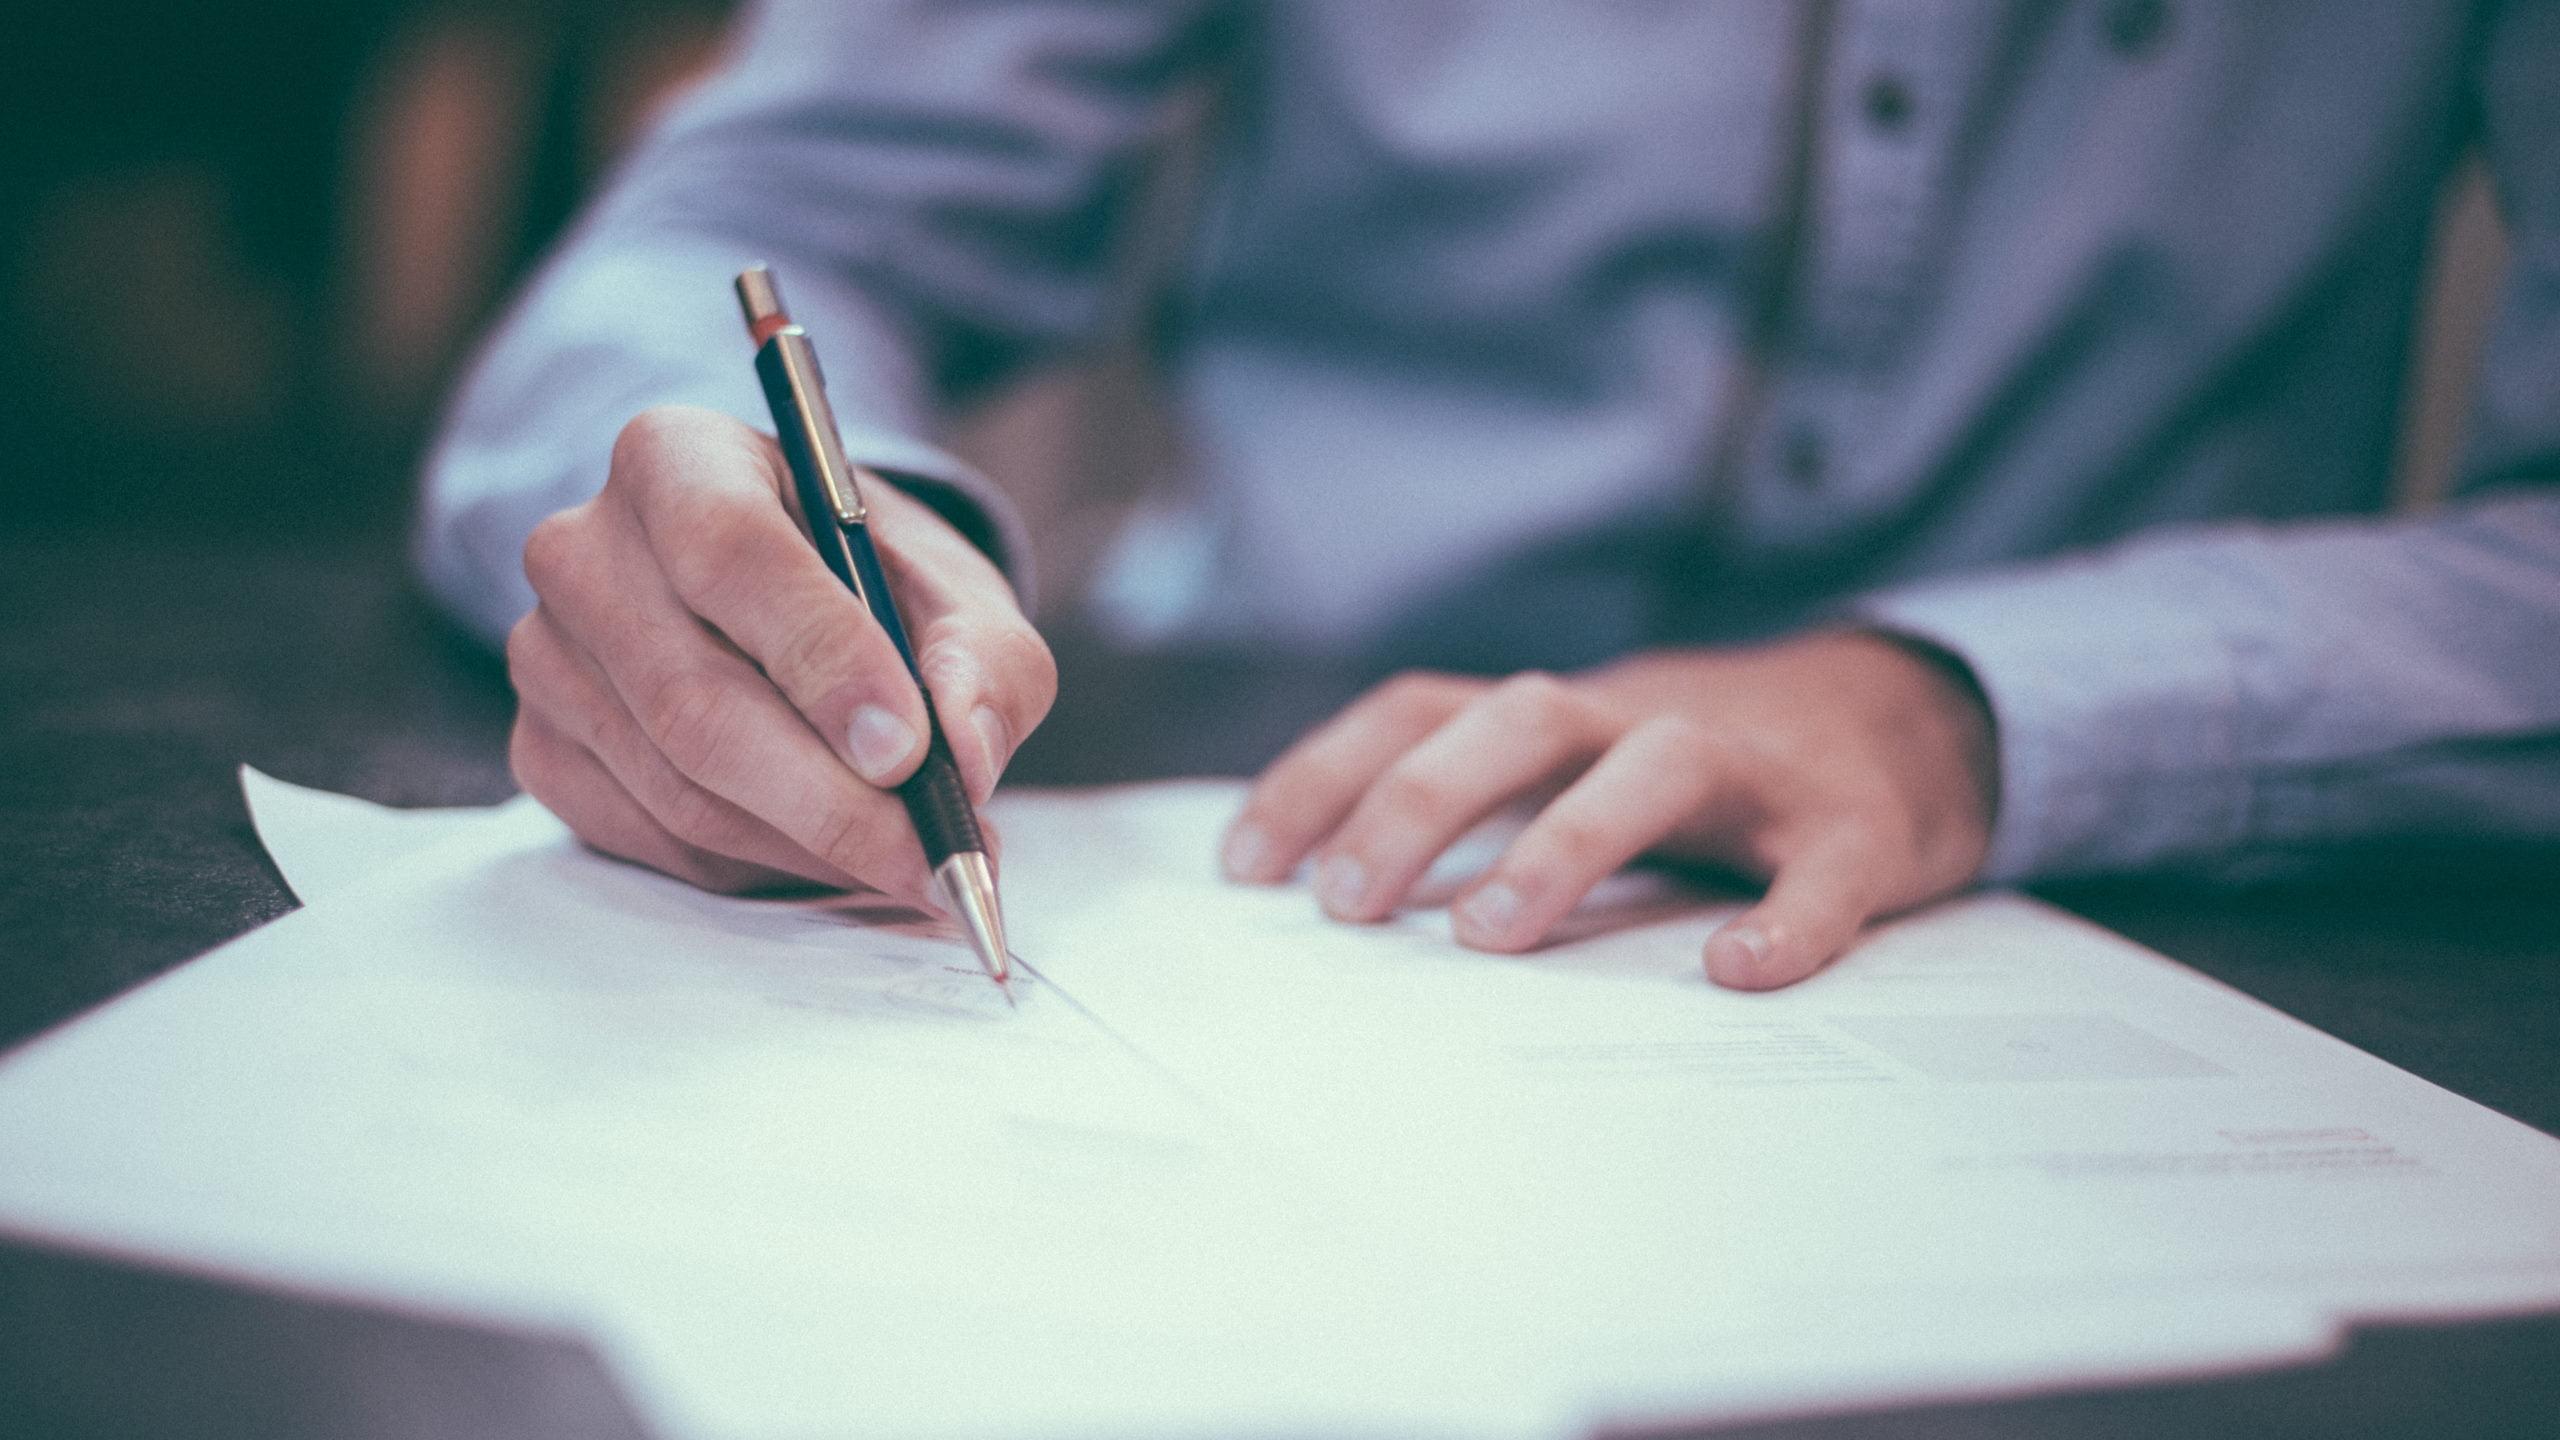 hand signature stock unsplash